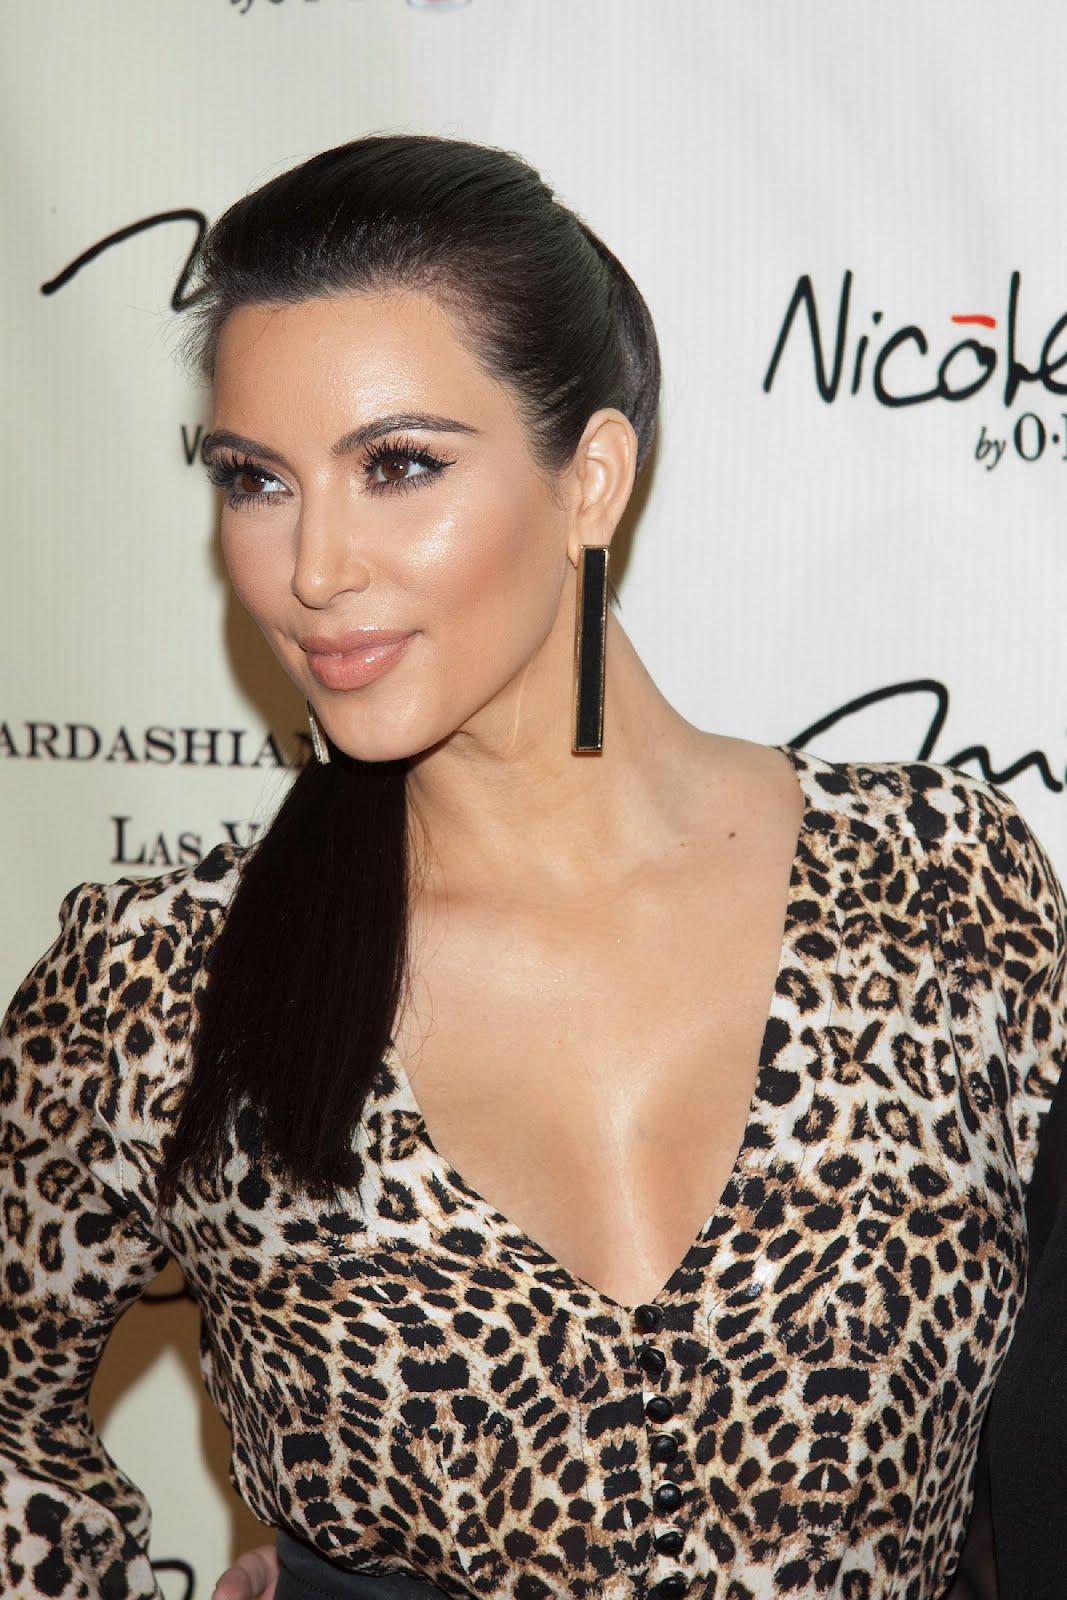 http://3.bp.blogspot.com/-sk0gzGmhKYA/TxyTiE1cHbI/AAAAAAAAH_A/g-WSav3gVBk/s1600/sploogeblog_kim_kardashian_busty_cleavage_leopardprint_minidress_01.jpg